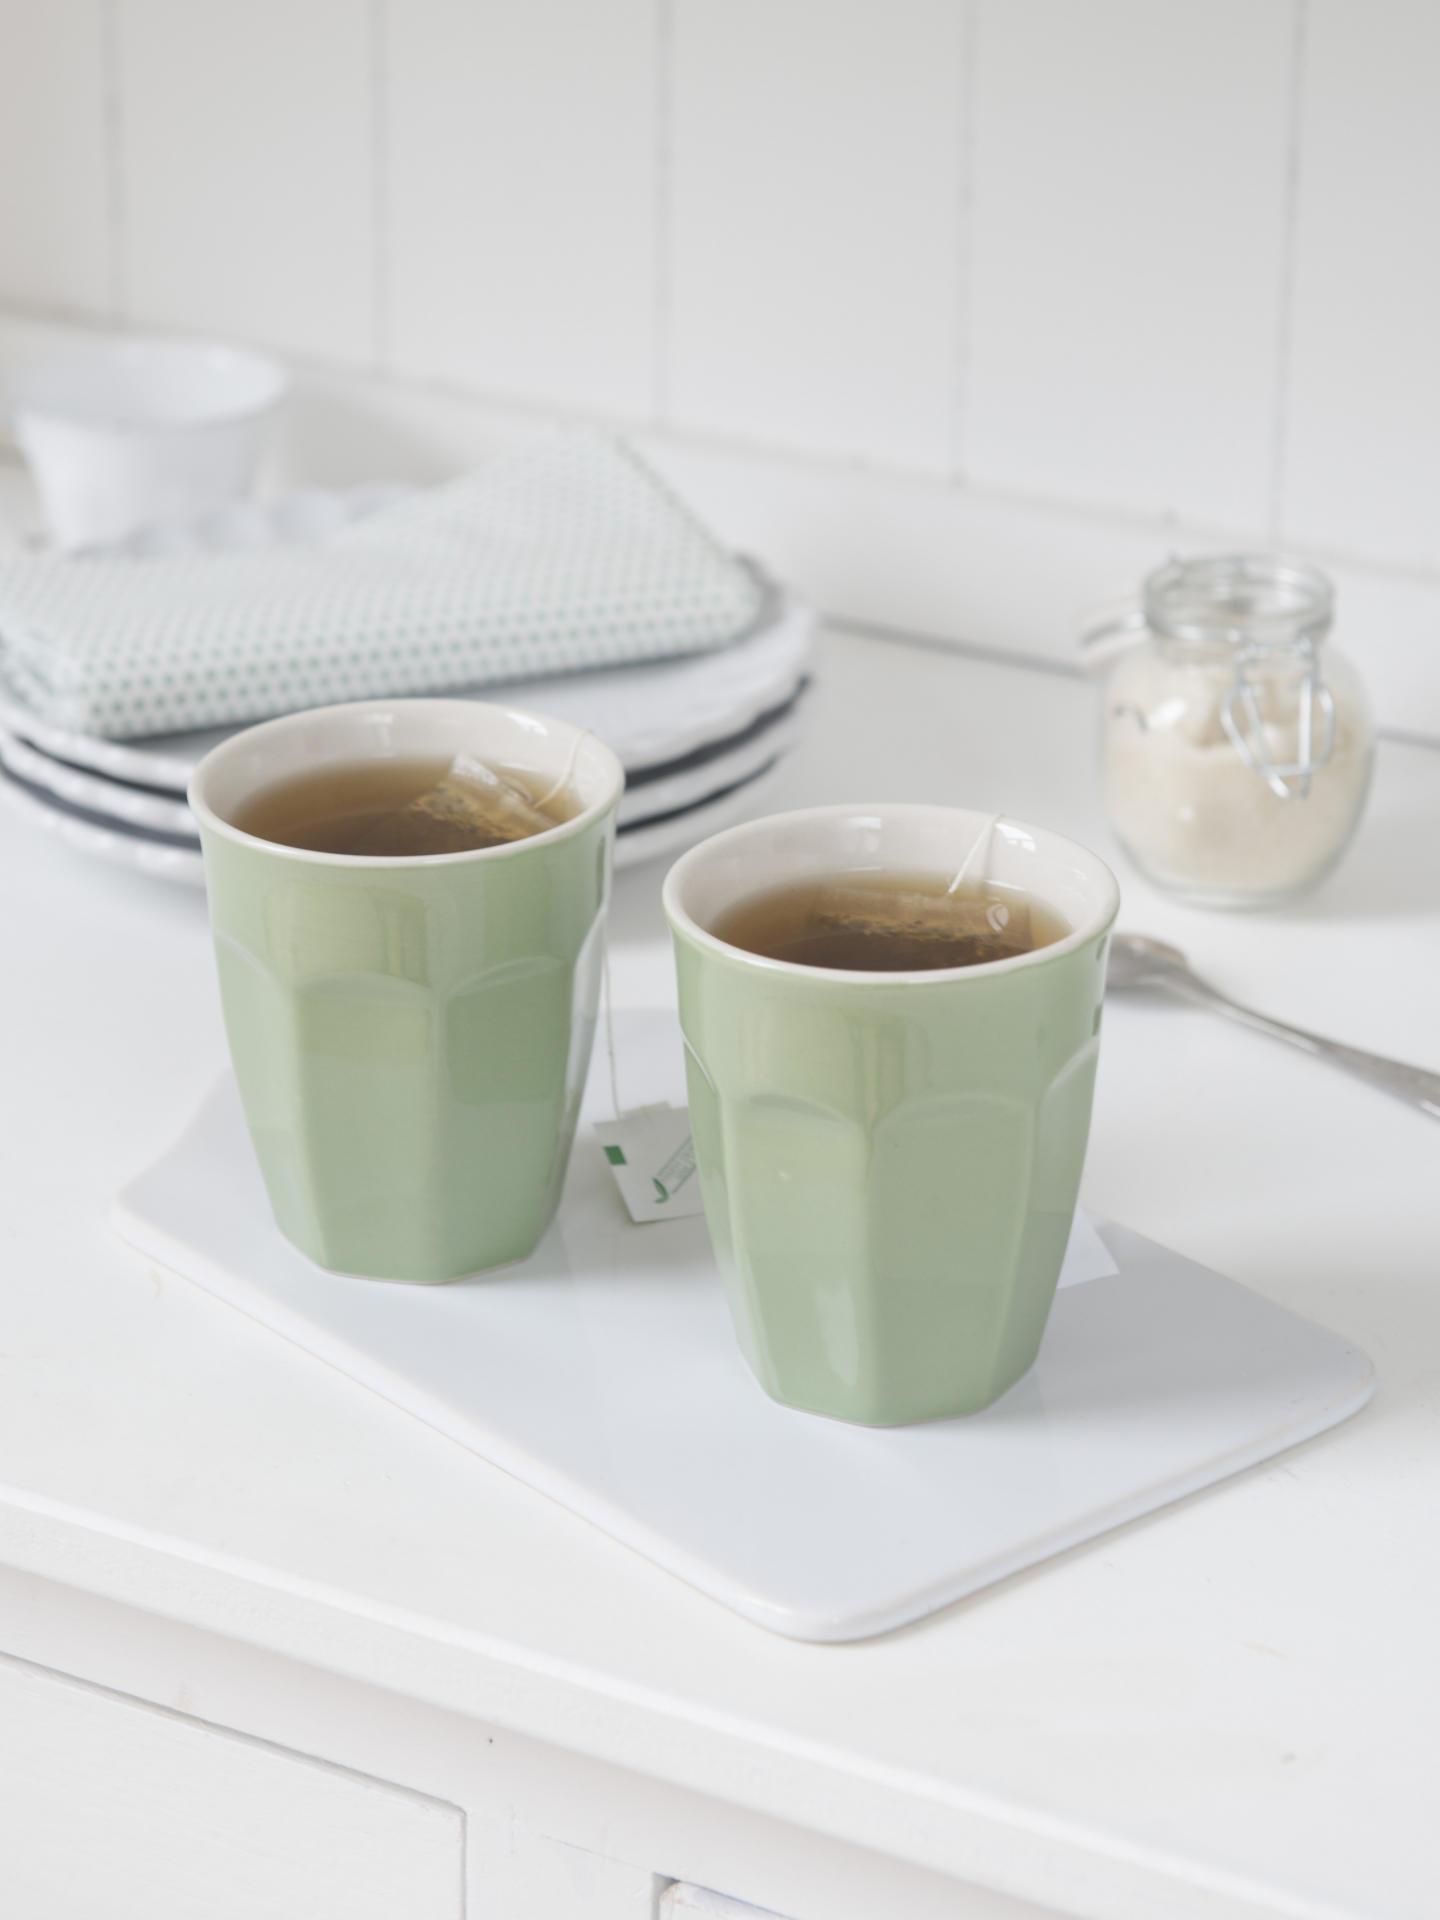 IB LAURSEN Latte hrneček Mynte Meadow green, zelená barva, keramika